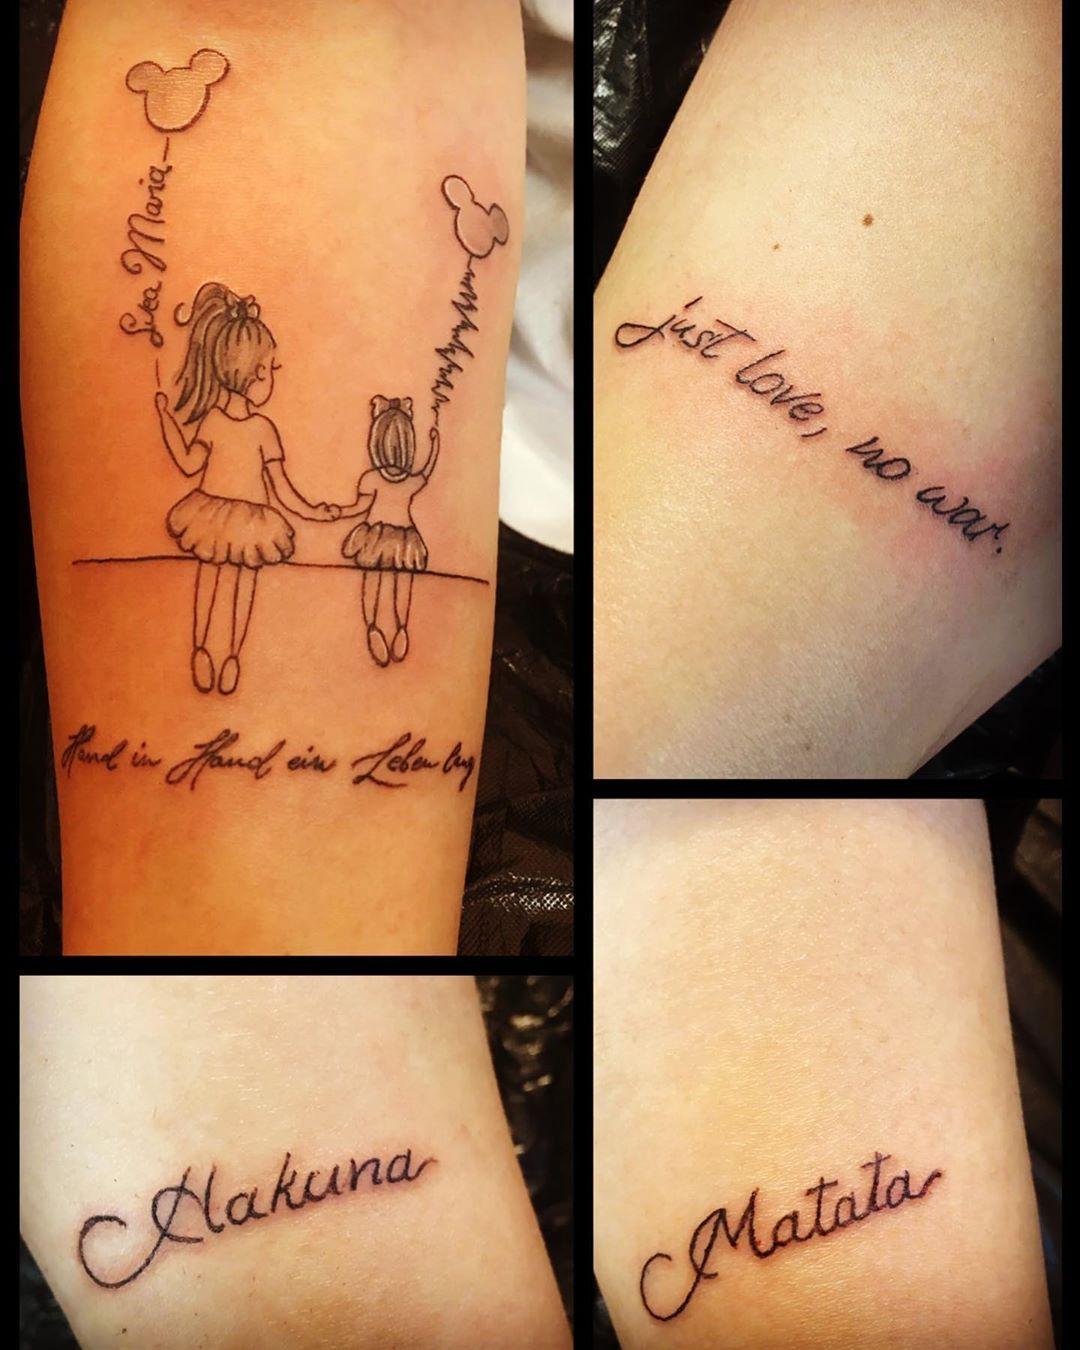 Tattooink Tattoos Karlsruhe Heavens Neueroffnung Tattoomodels Karlsruhe Neueroffnung Tattoo Tattoostyle Bruchsal E Girl Tattoos Tattoos Cool Tattoos